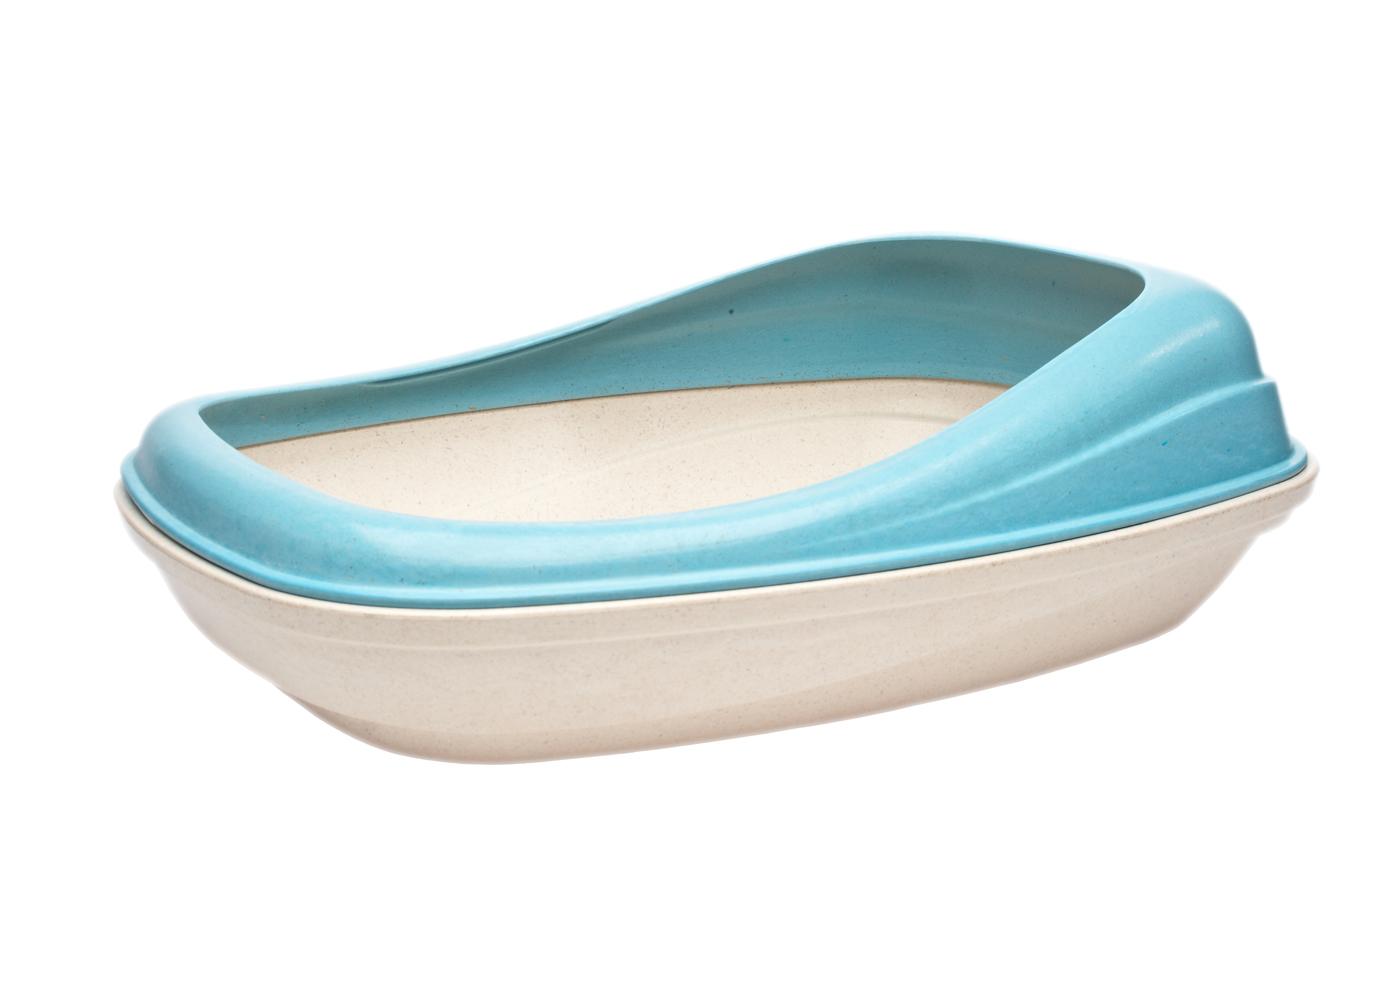 Beco Tray Cat Litter Pan - Blue